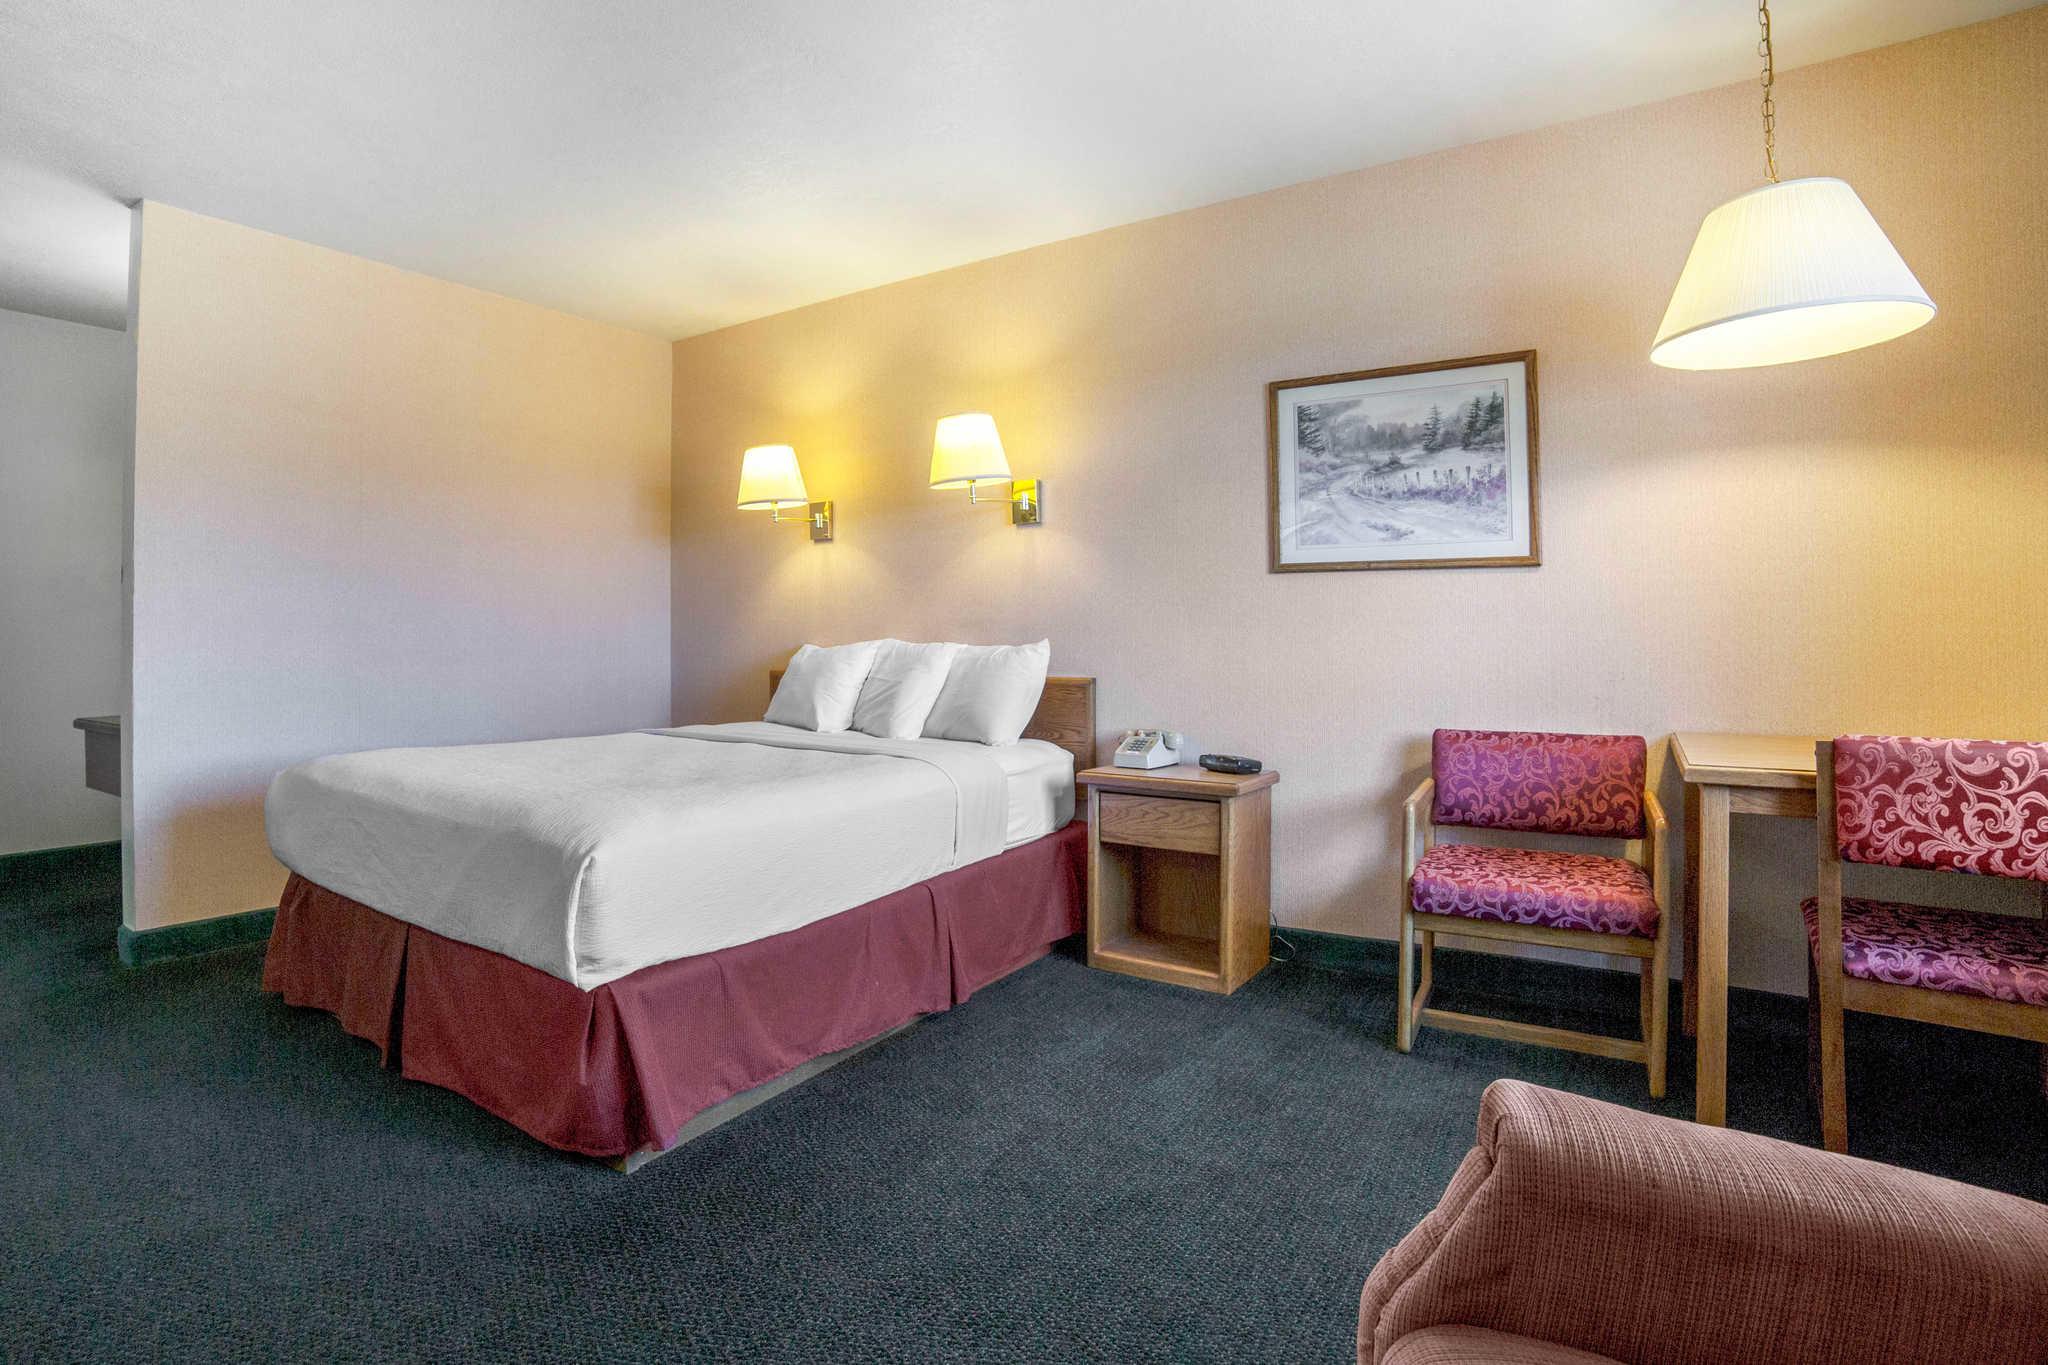 Rodeway Inn image 18